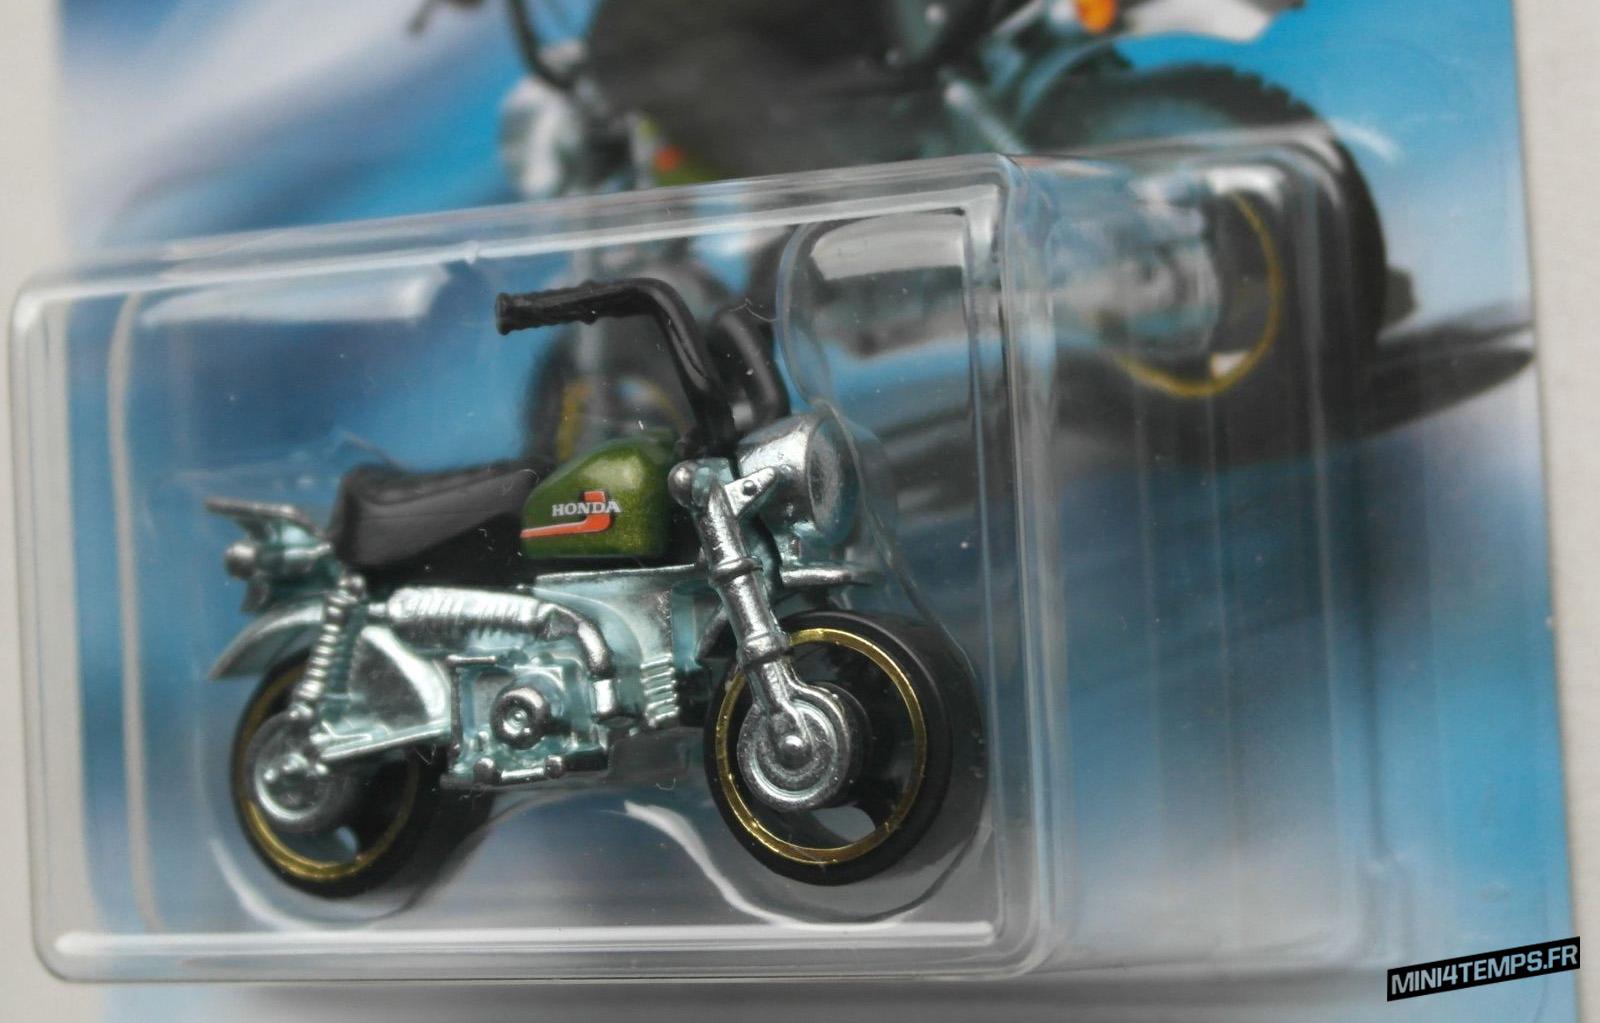 Honda Monkey Z50 2018 chez Hotwheels - mini4temps.fr